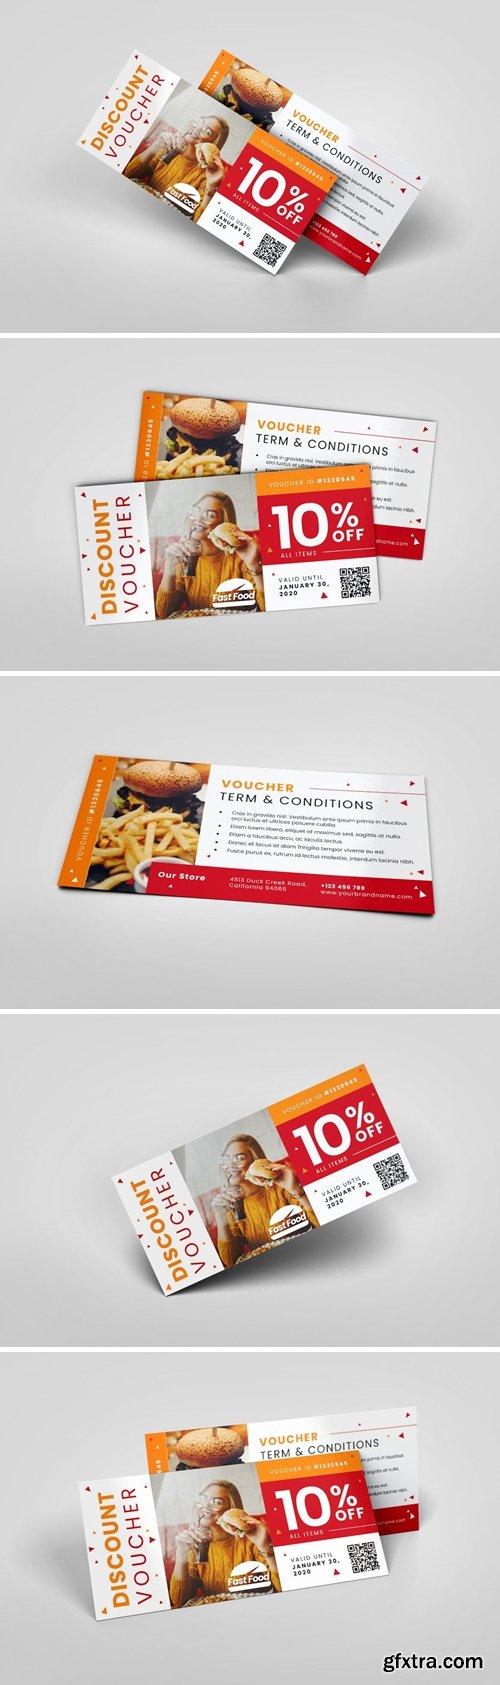 Fastfood Restaurant AI and PSD Gift Voucher